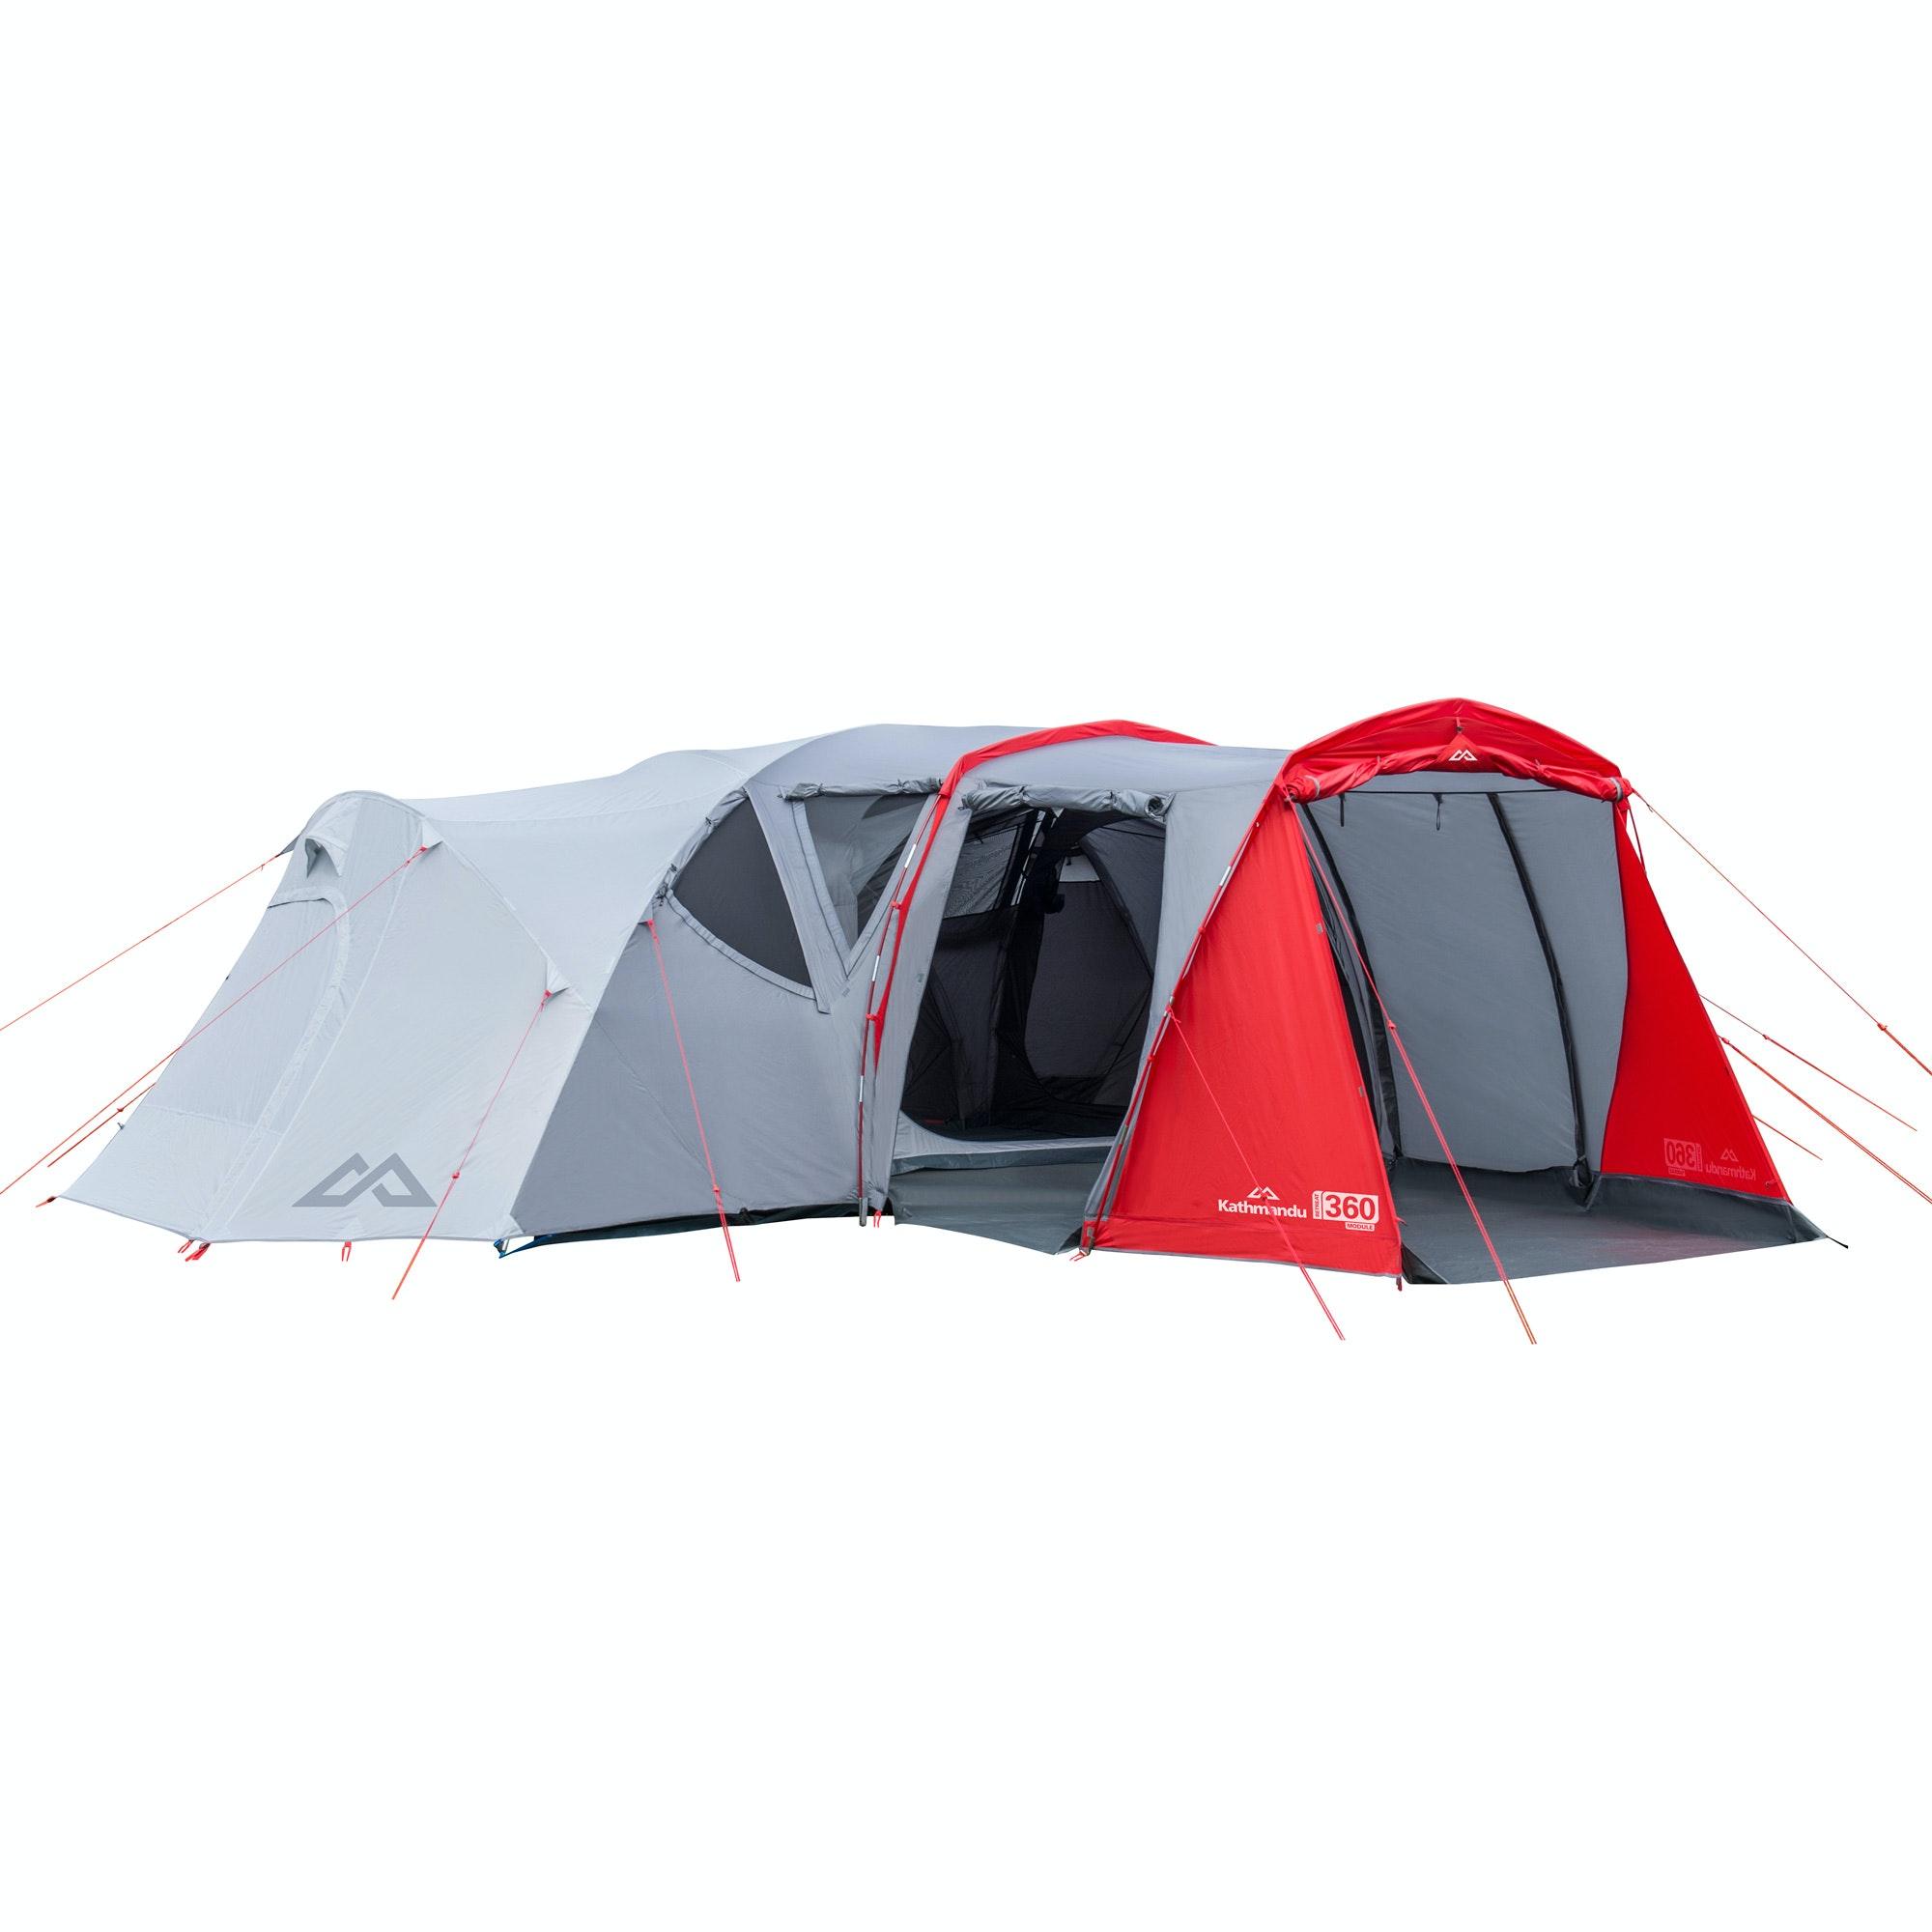 Retreat 360 7 Person Module Tent  sc 1 st  Cool Antarctica & Tents - Outdoor Recreation - Camping - Australia